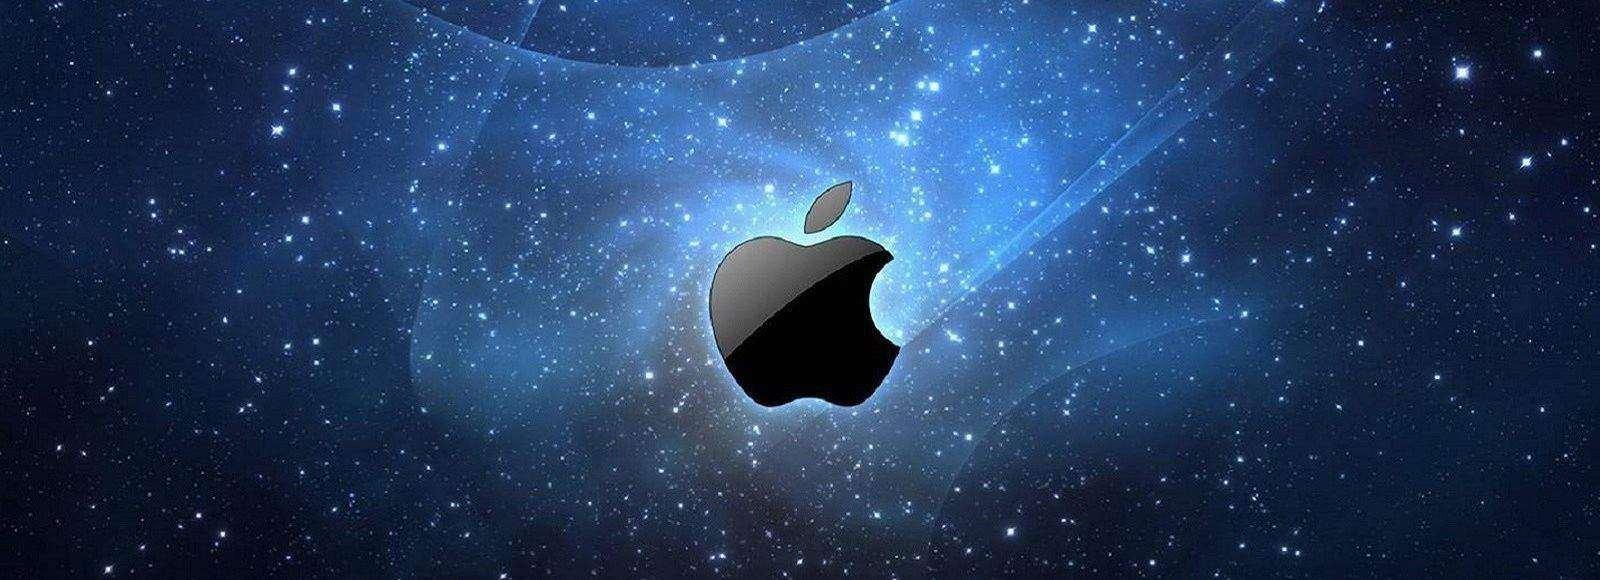 deepfreeze mac